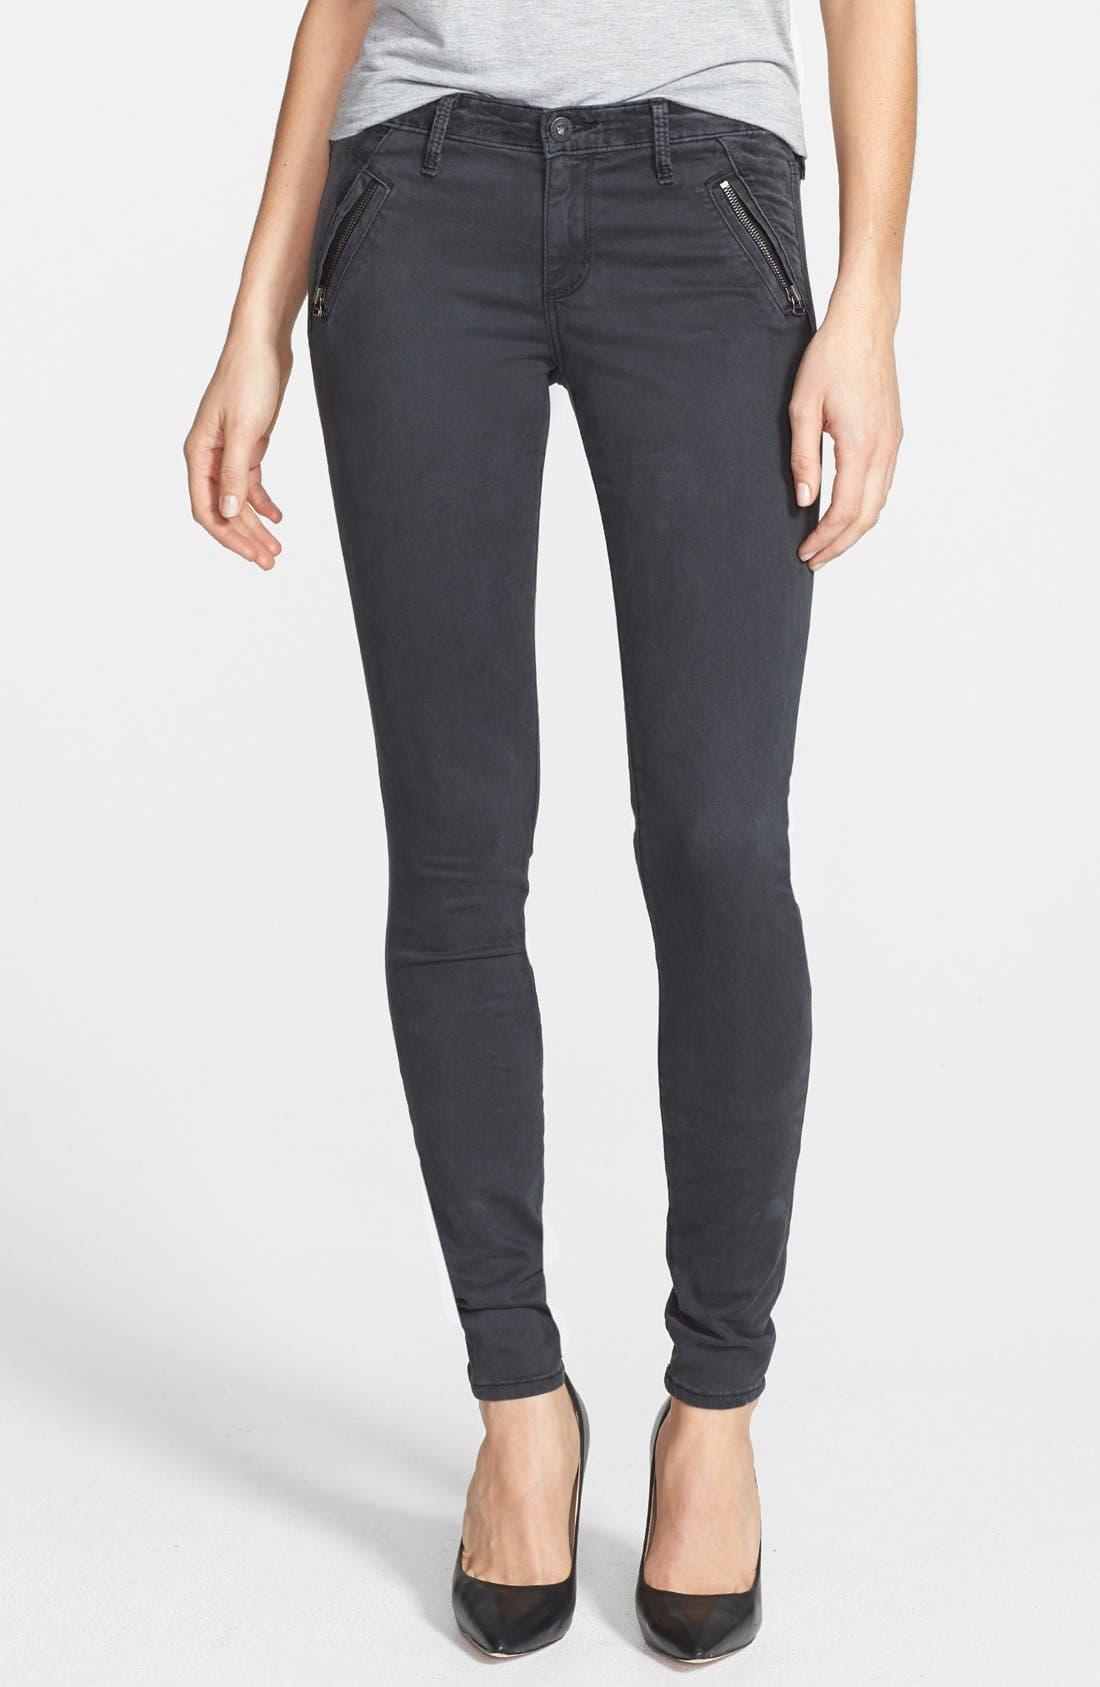 Main Image - AG Zip Pocket Sateen Skinny Jeans (Sulfur Dark Charcoal)